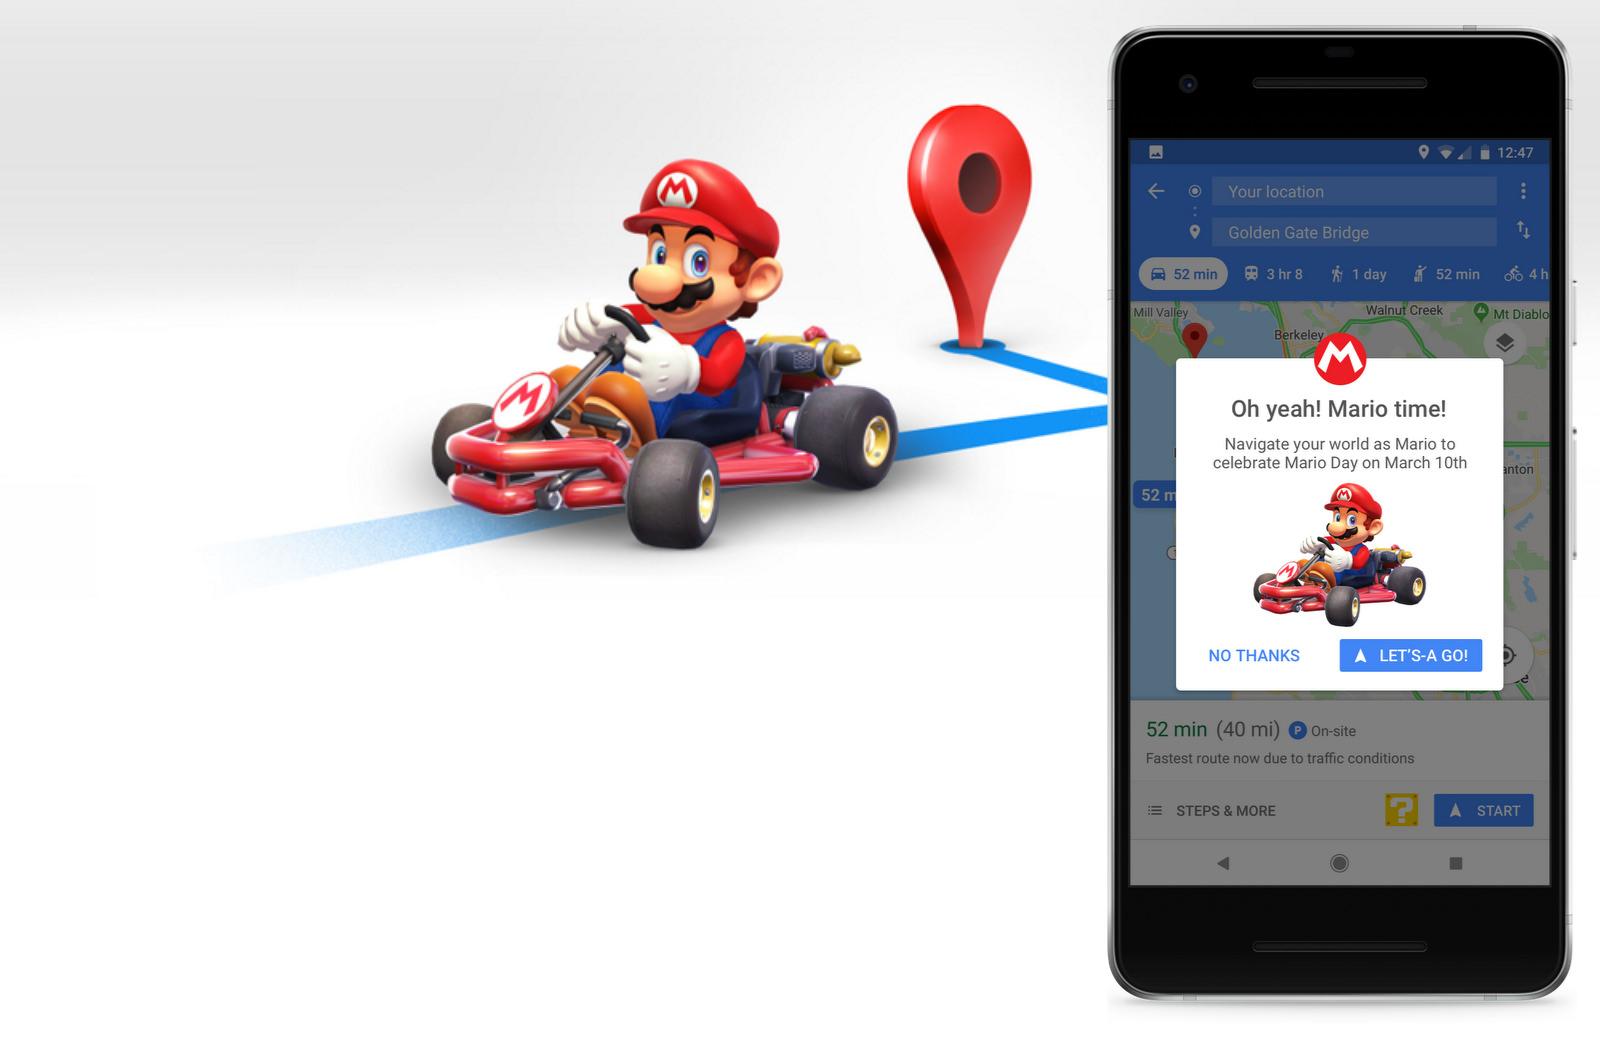 Super-Mario-Cart-collab-with-Google-Maps.jpg